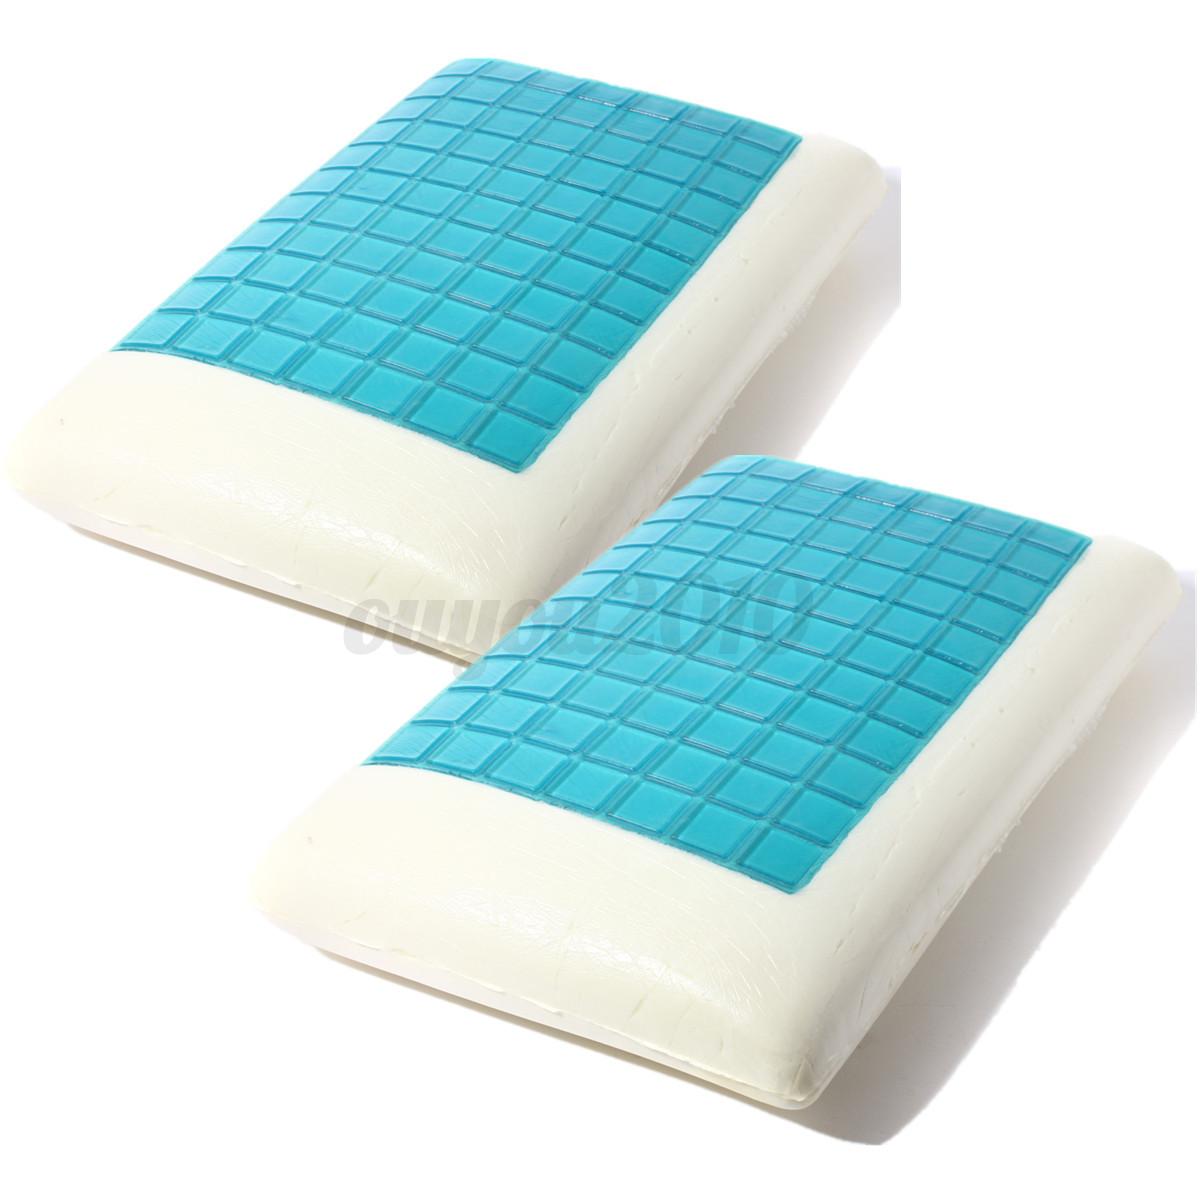 2pcs Premium Solid Memory Foam Gel White Bed Pillows Blue